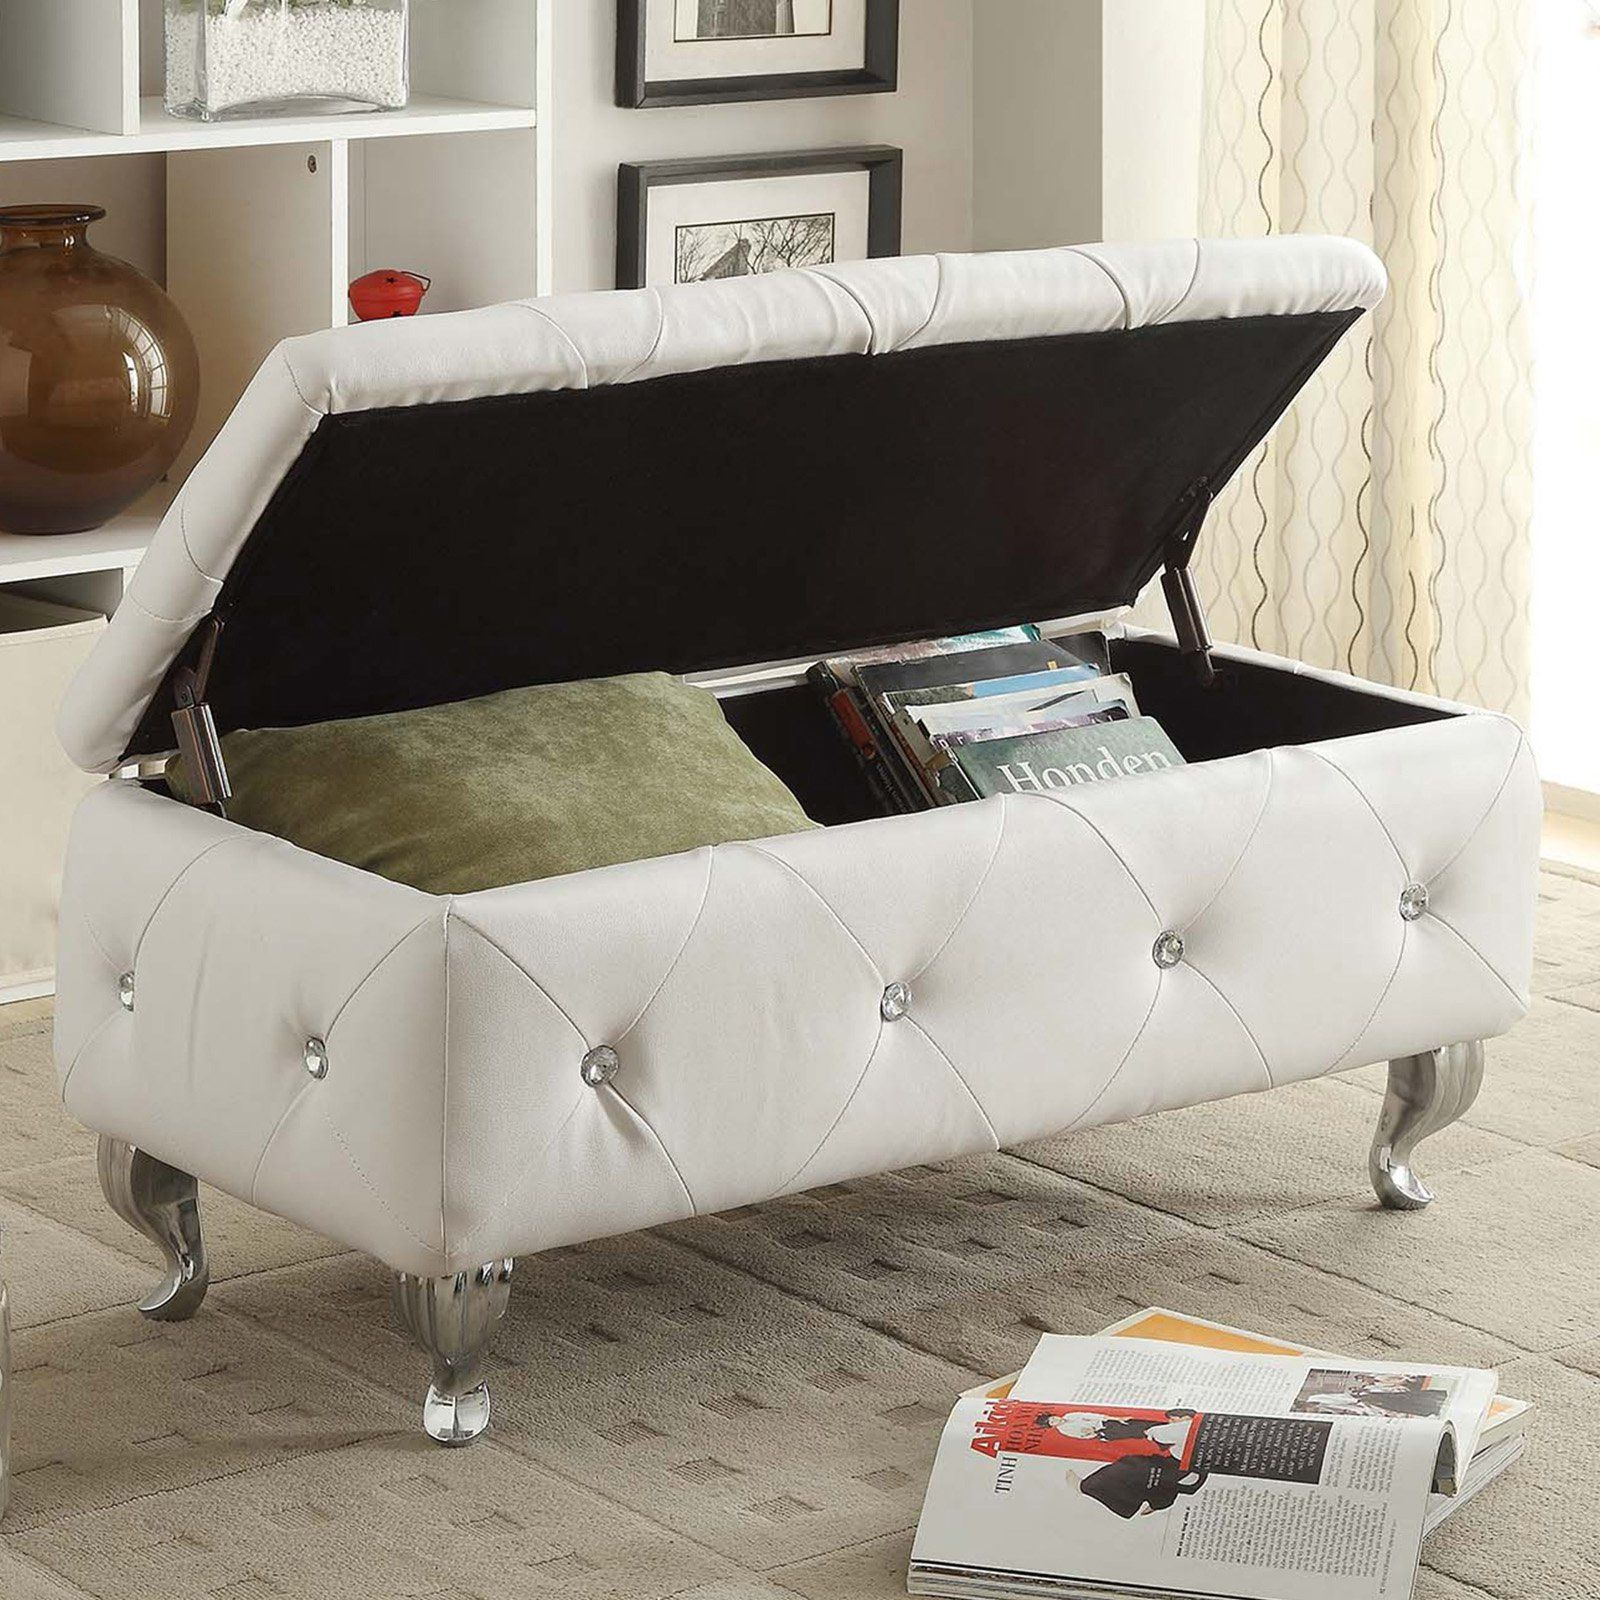 Enjoyable Christies Home Living Crystal Tufted Storage Bench White Inzonedesignstudio Interior Chair Design Inzonedesignstudiocom